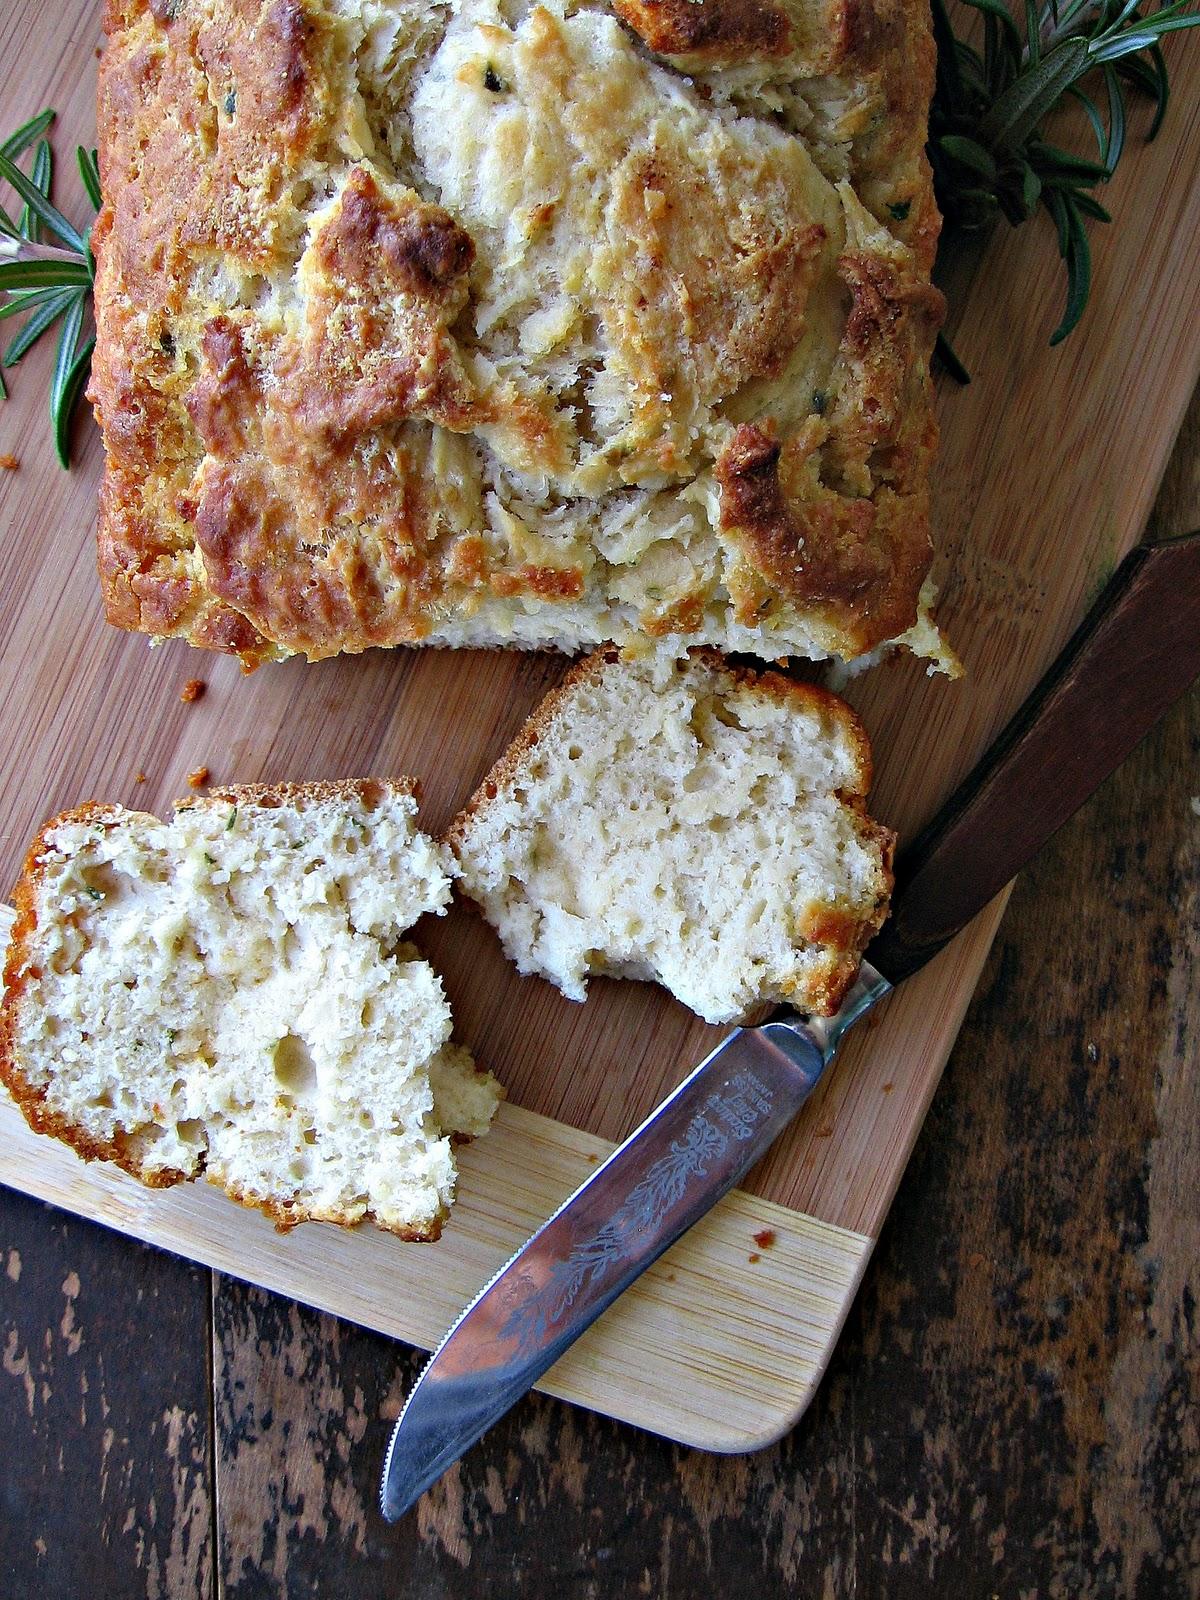 sweetsugarbean: Bacon, Potato & Leek Soup with Rosemary Beer Bread